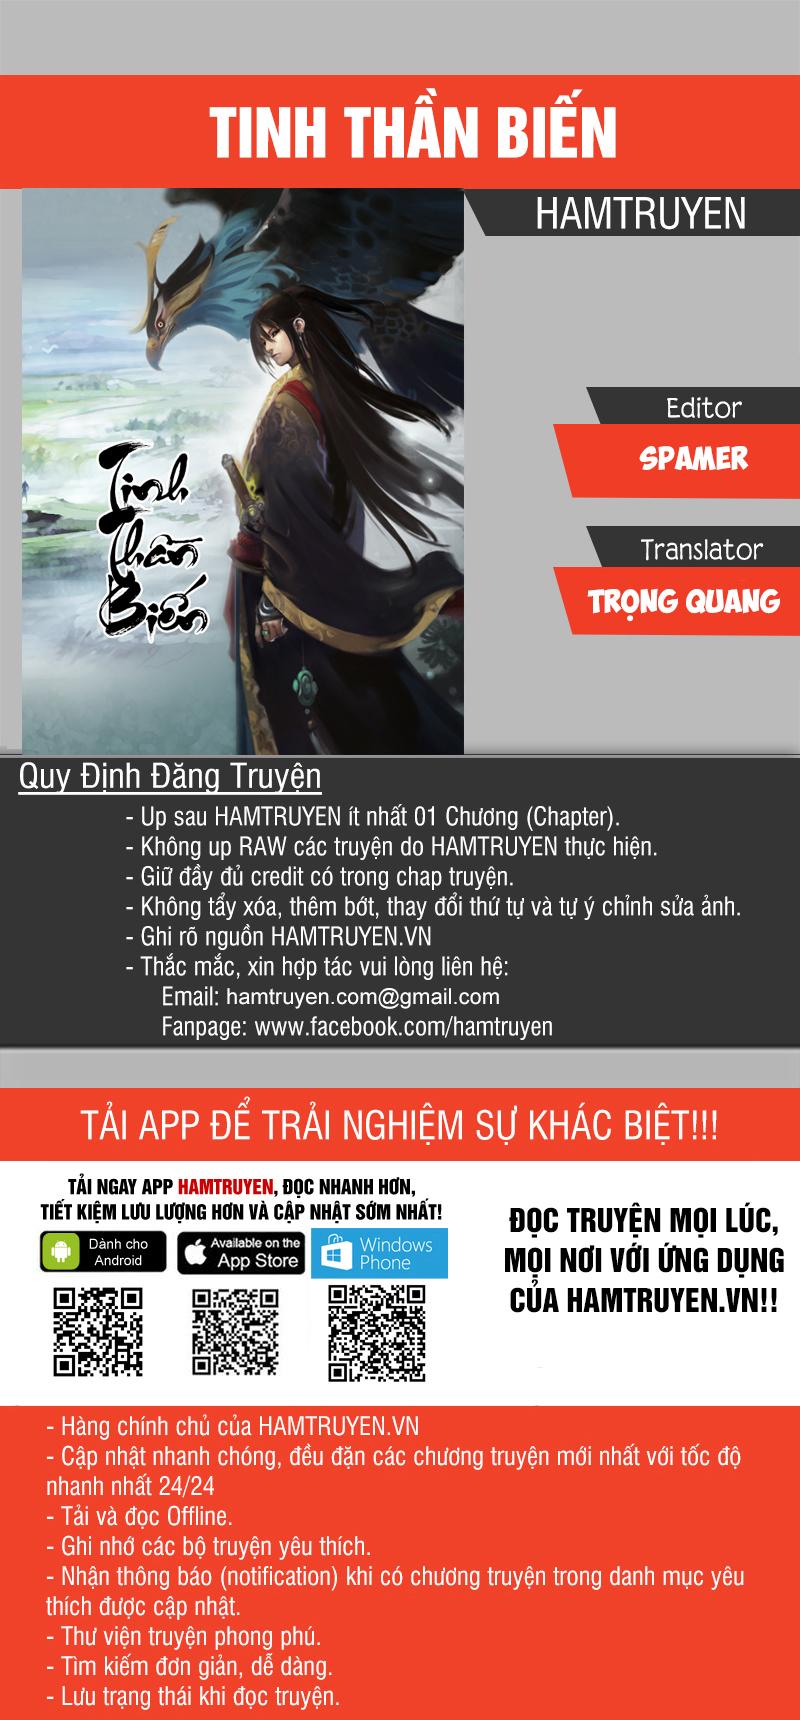 Tinh Thần Biến Chap 89 - Truyen.Chap.VN